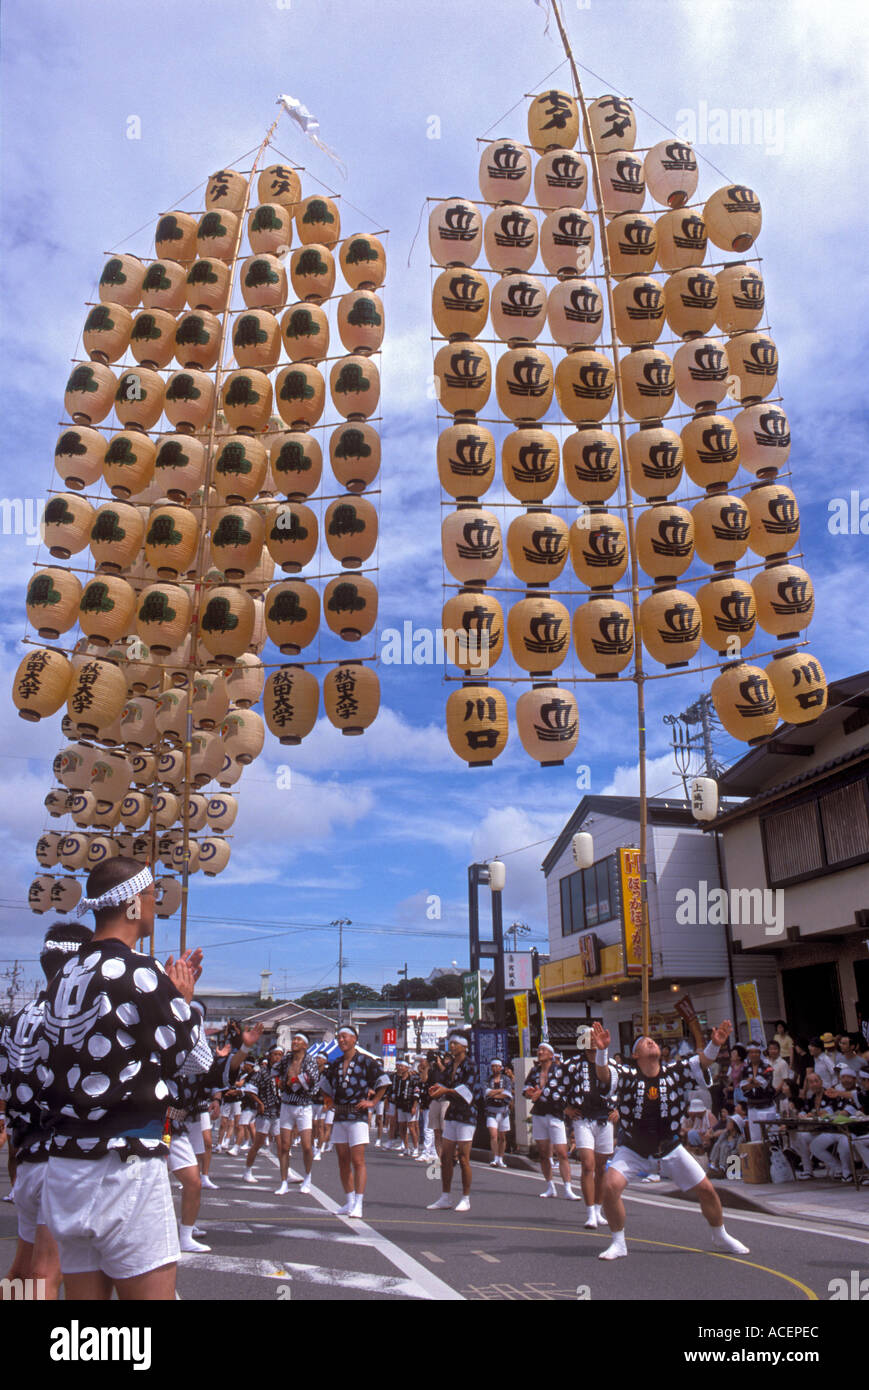 Lantern poles weighing up to 60 kilograms are balanced during the Kanto Matsuri festival in Akita Stock Photo